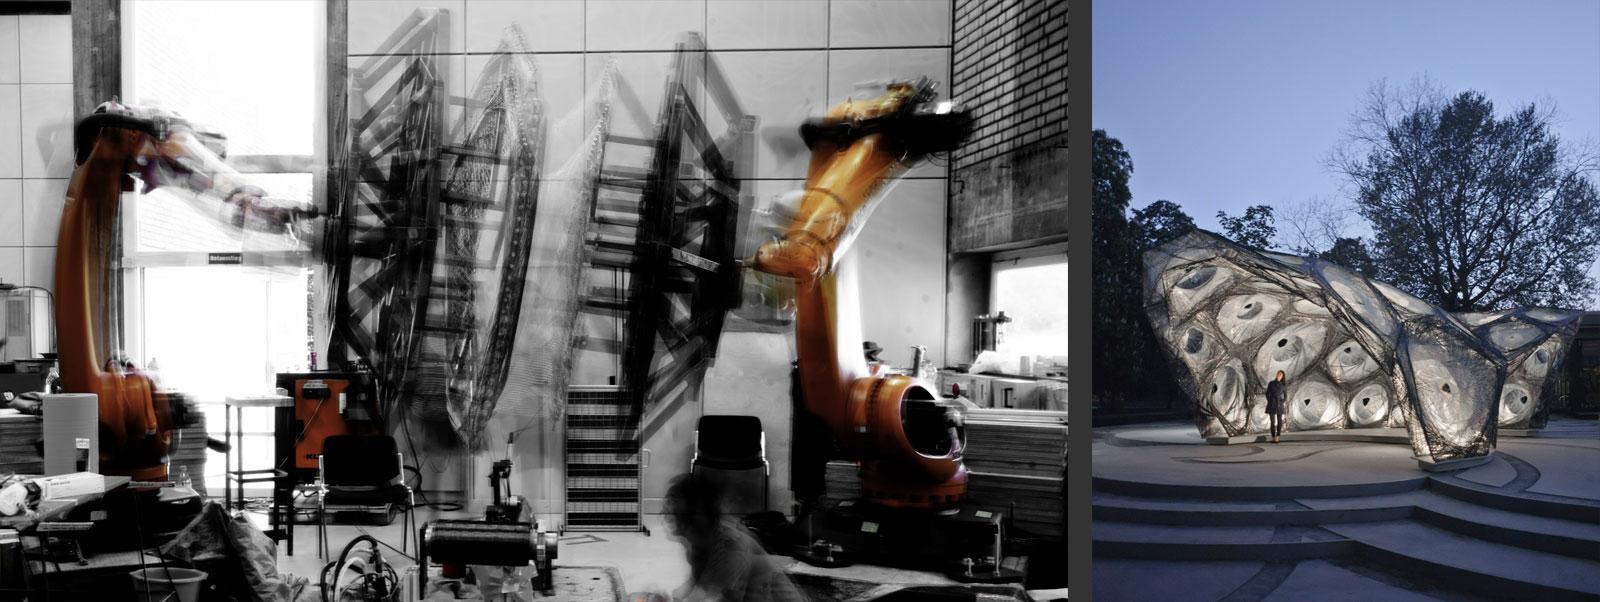 2 collaborative robots use carbon fibers for weaving pavilion structures. (ICD Stuttgart)